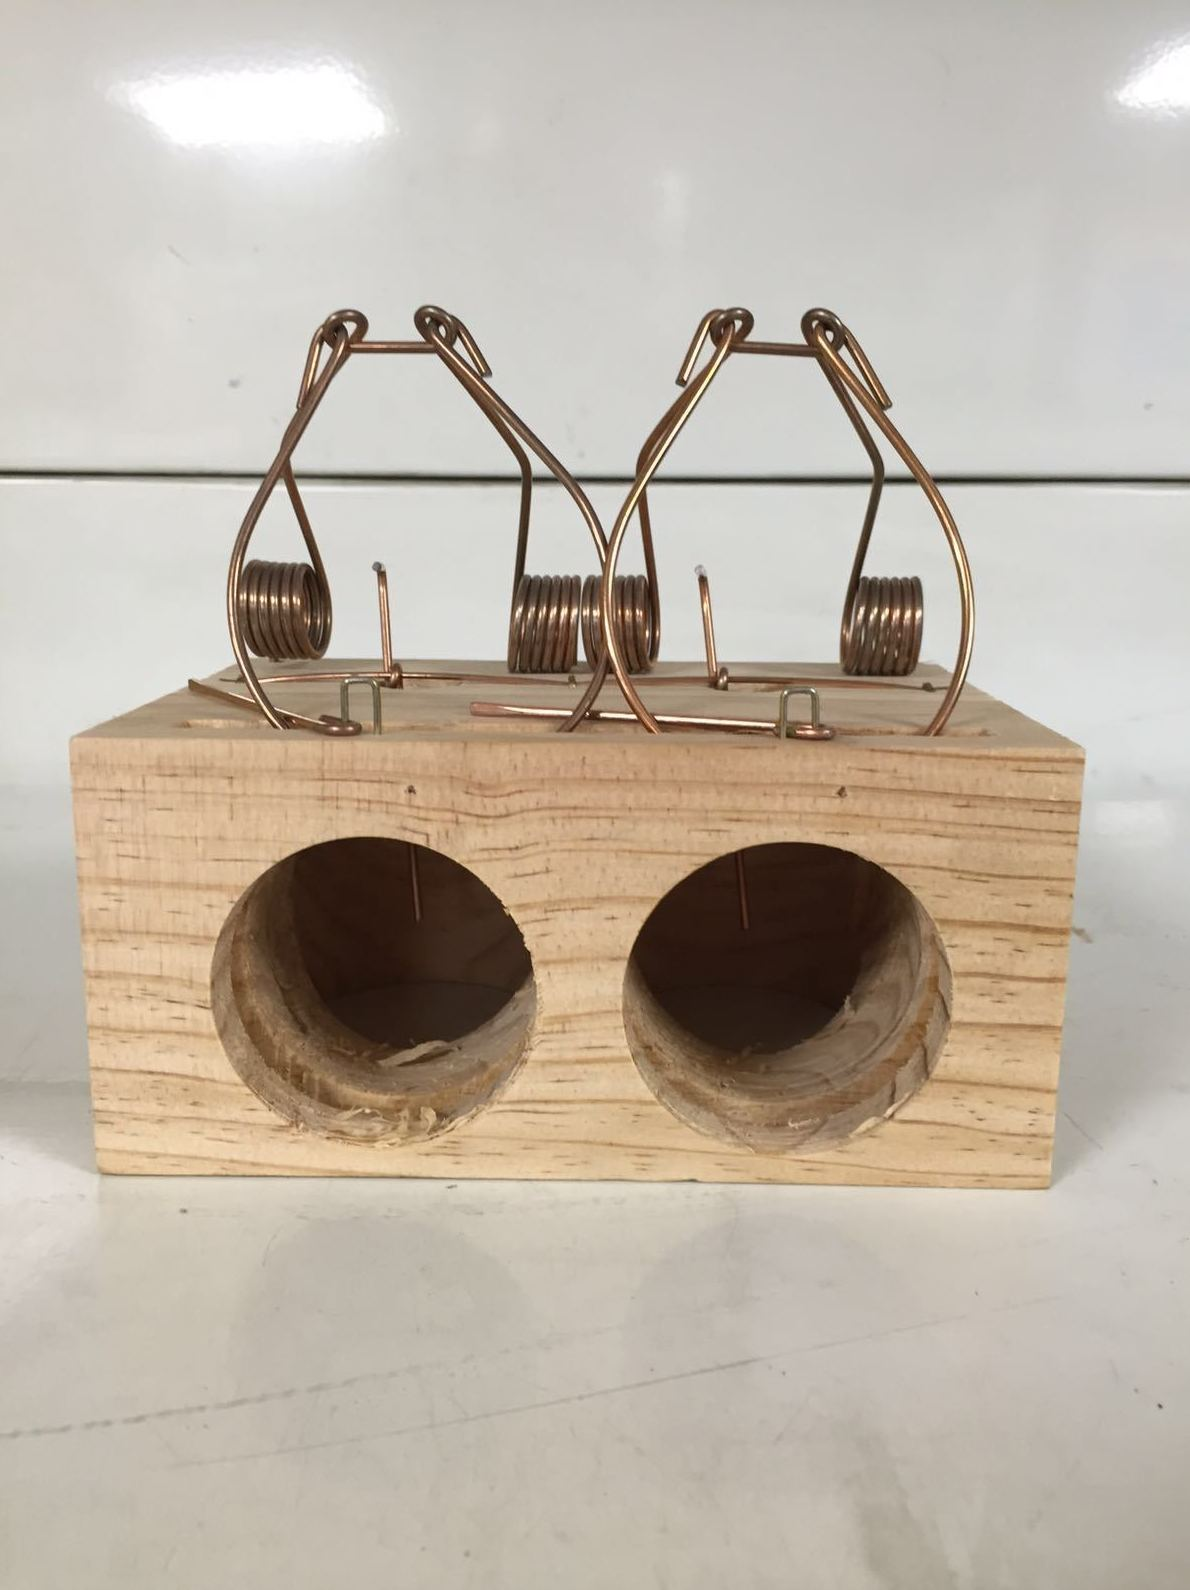 Venta de ratoneras de madera